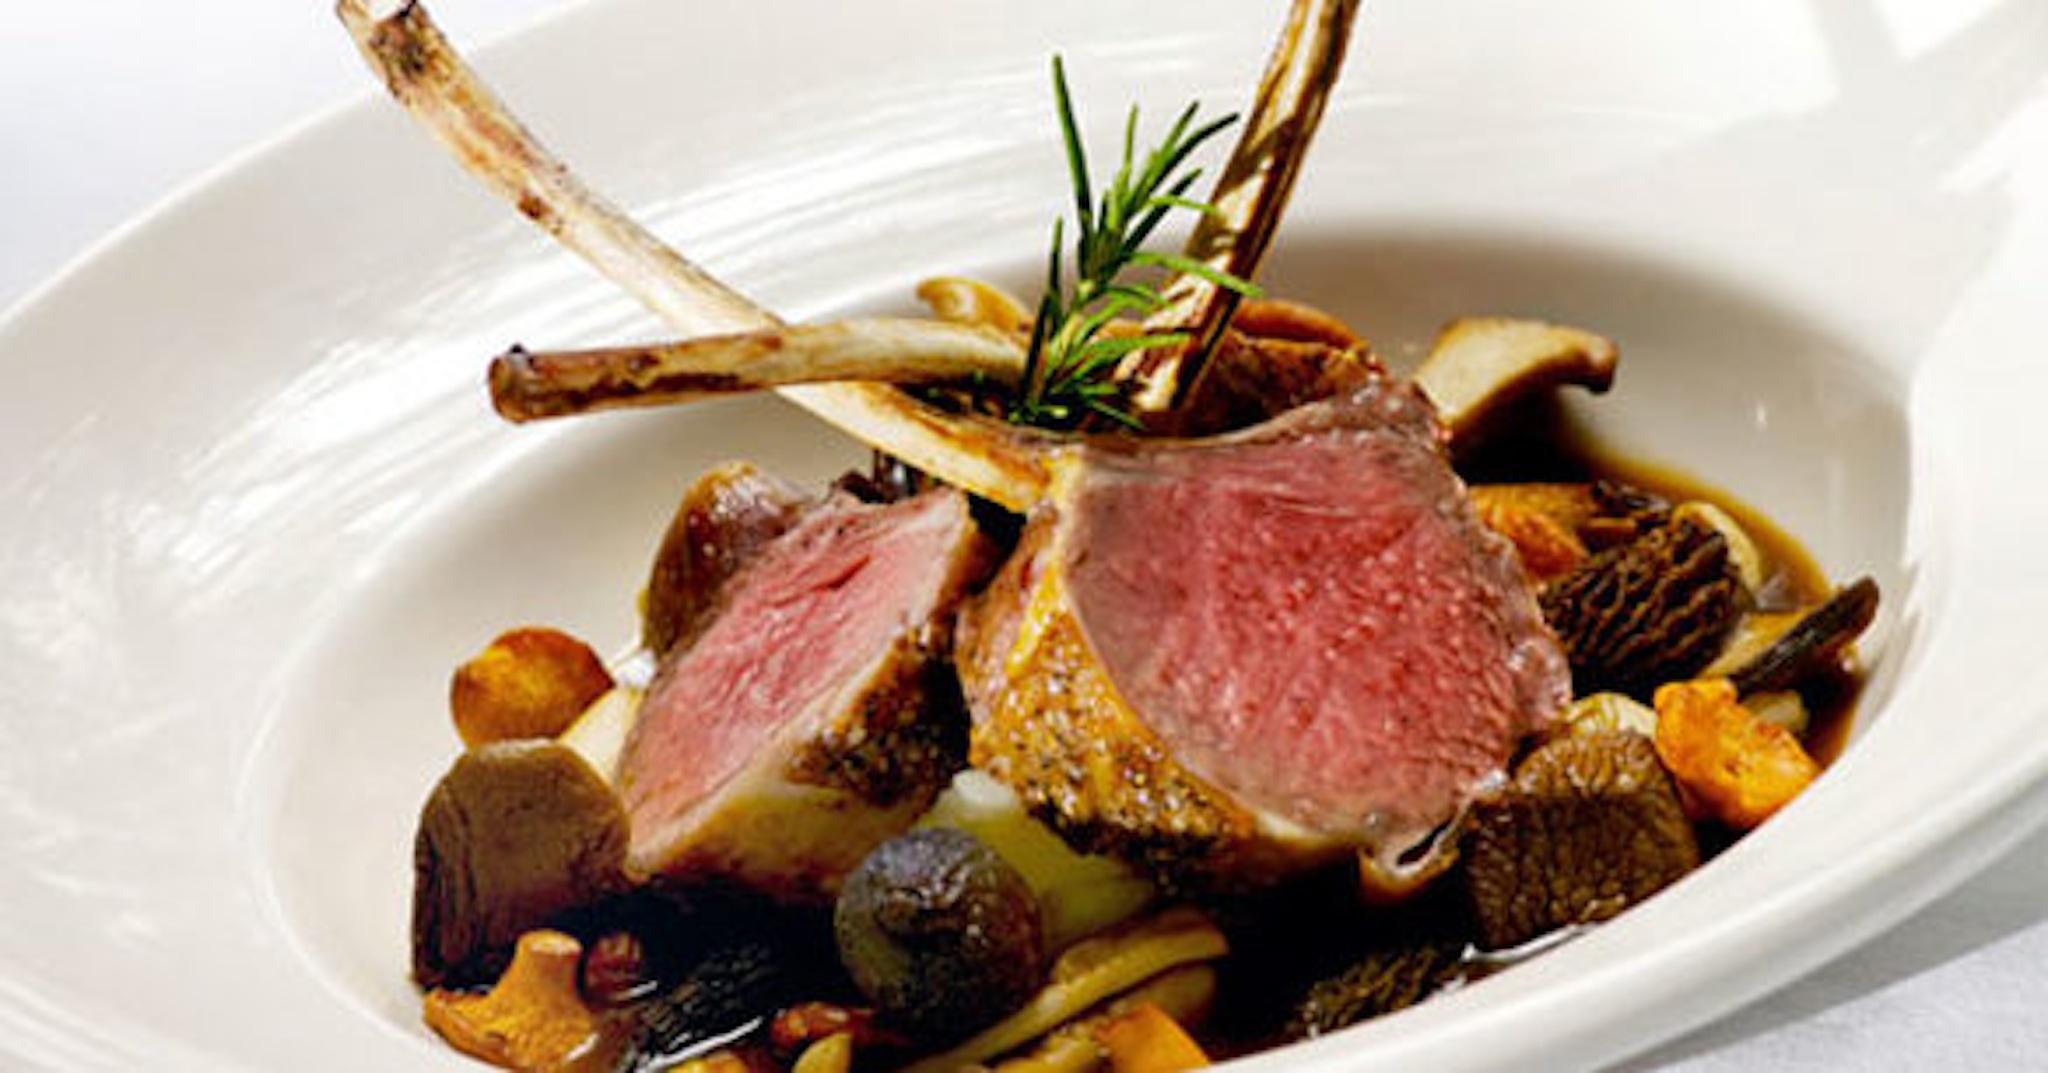 lamb chop plating presentation